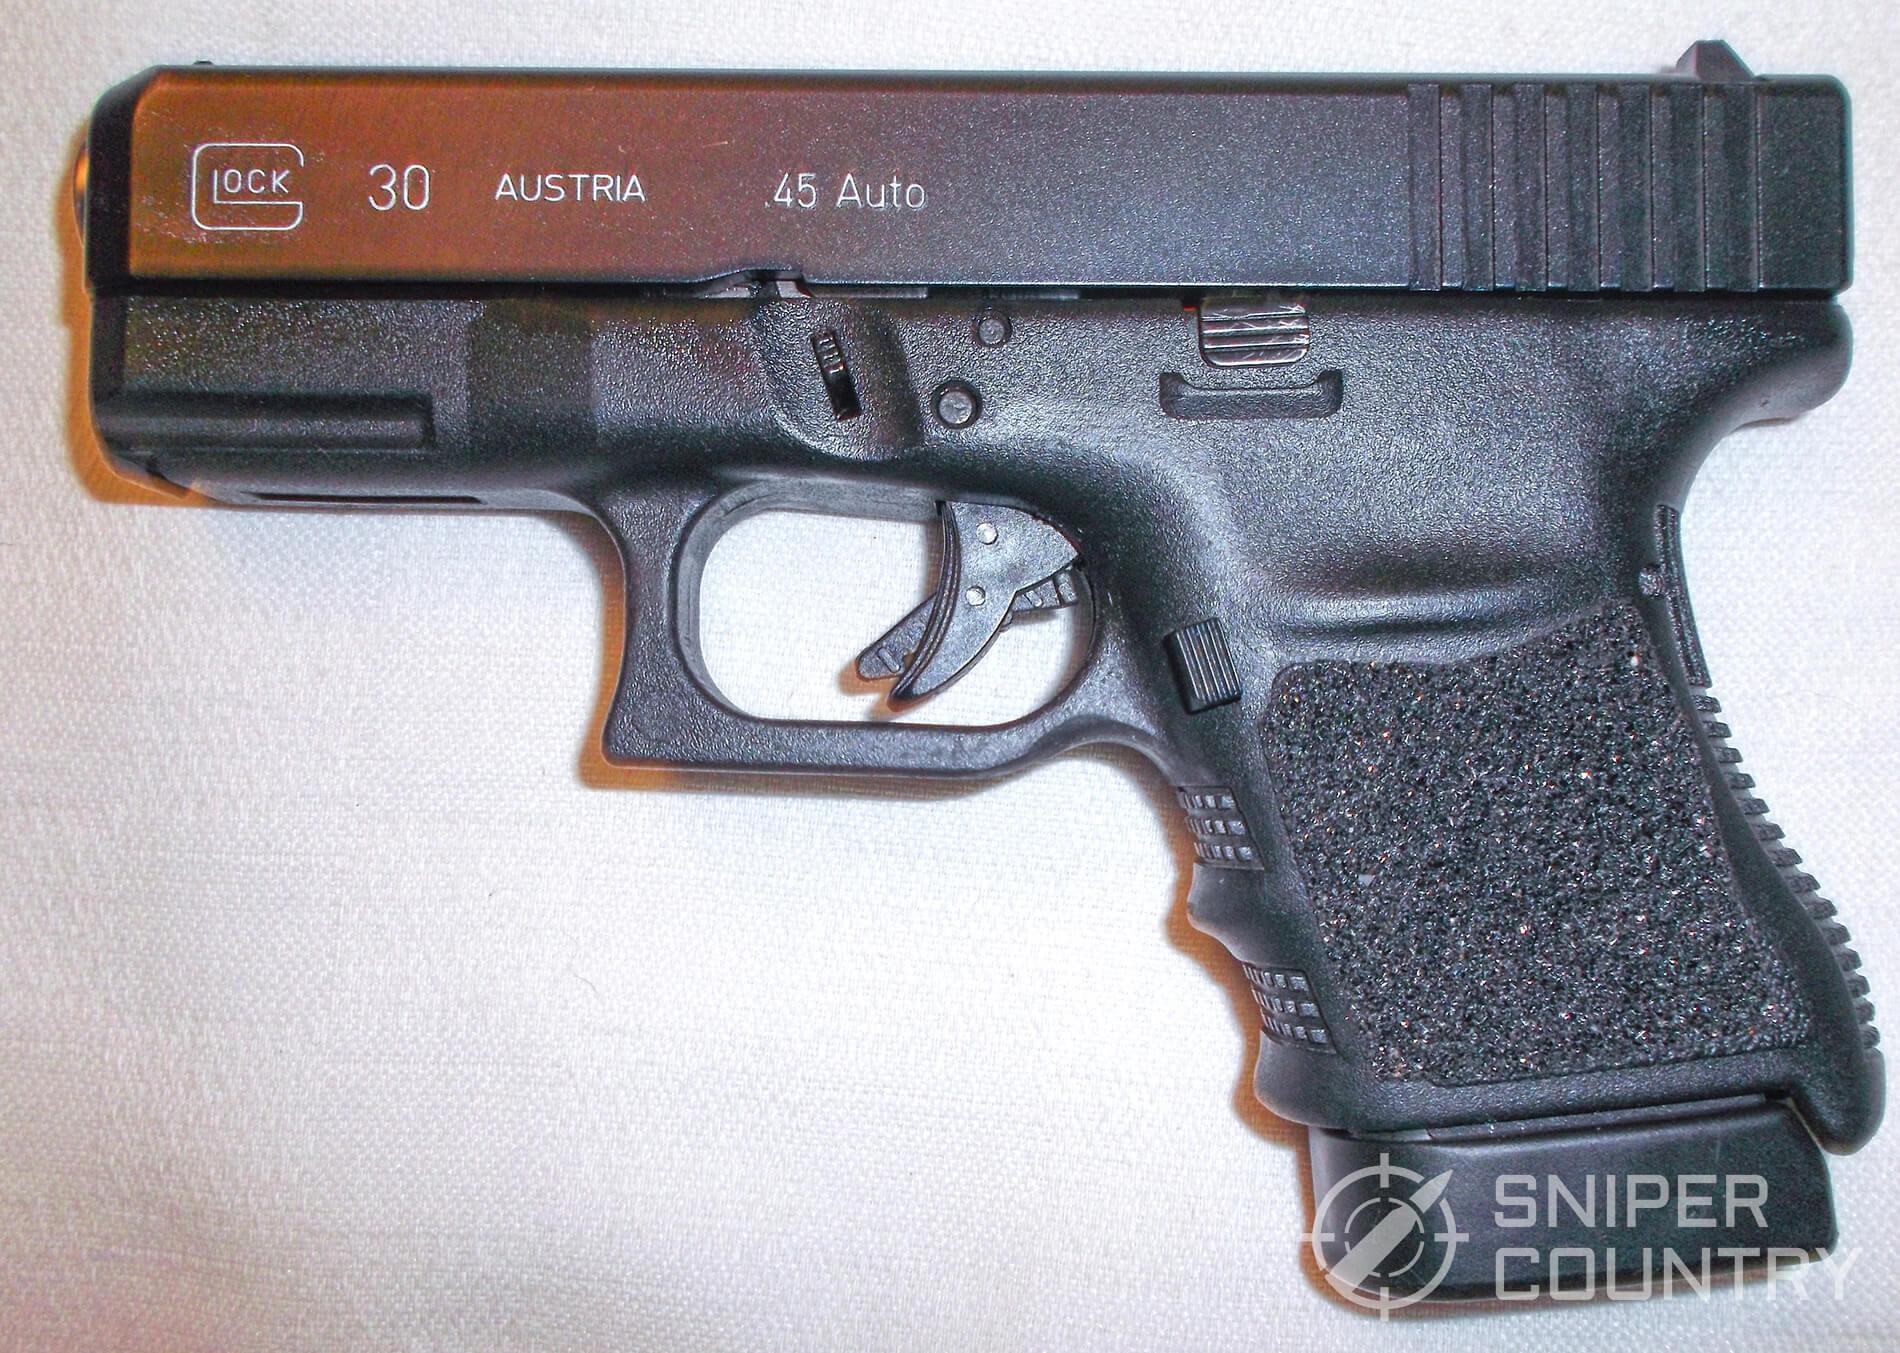 Glock 30 left side